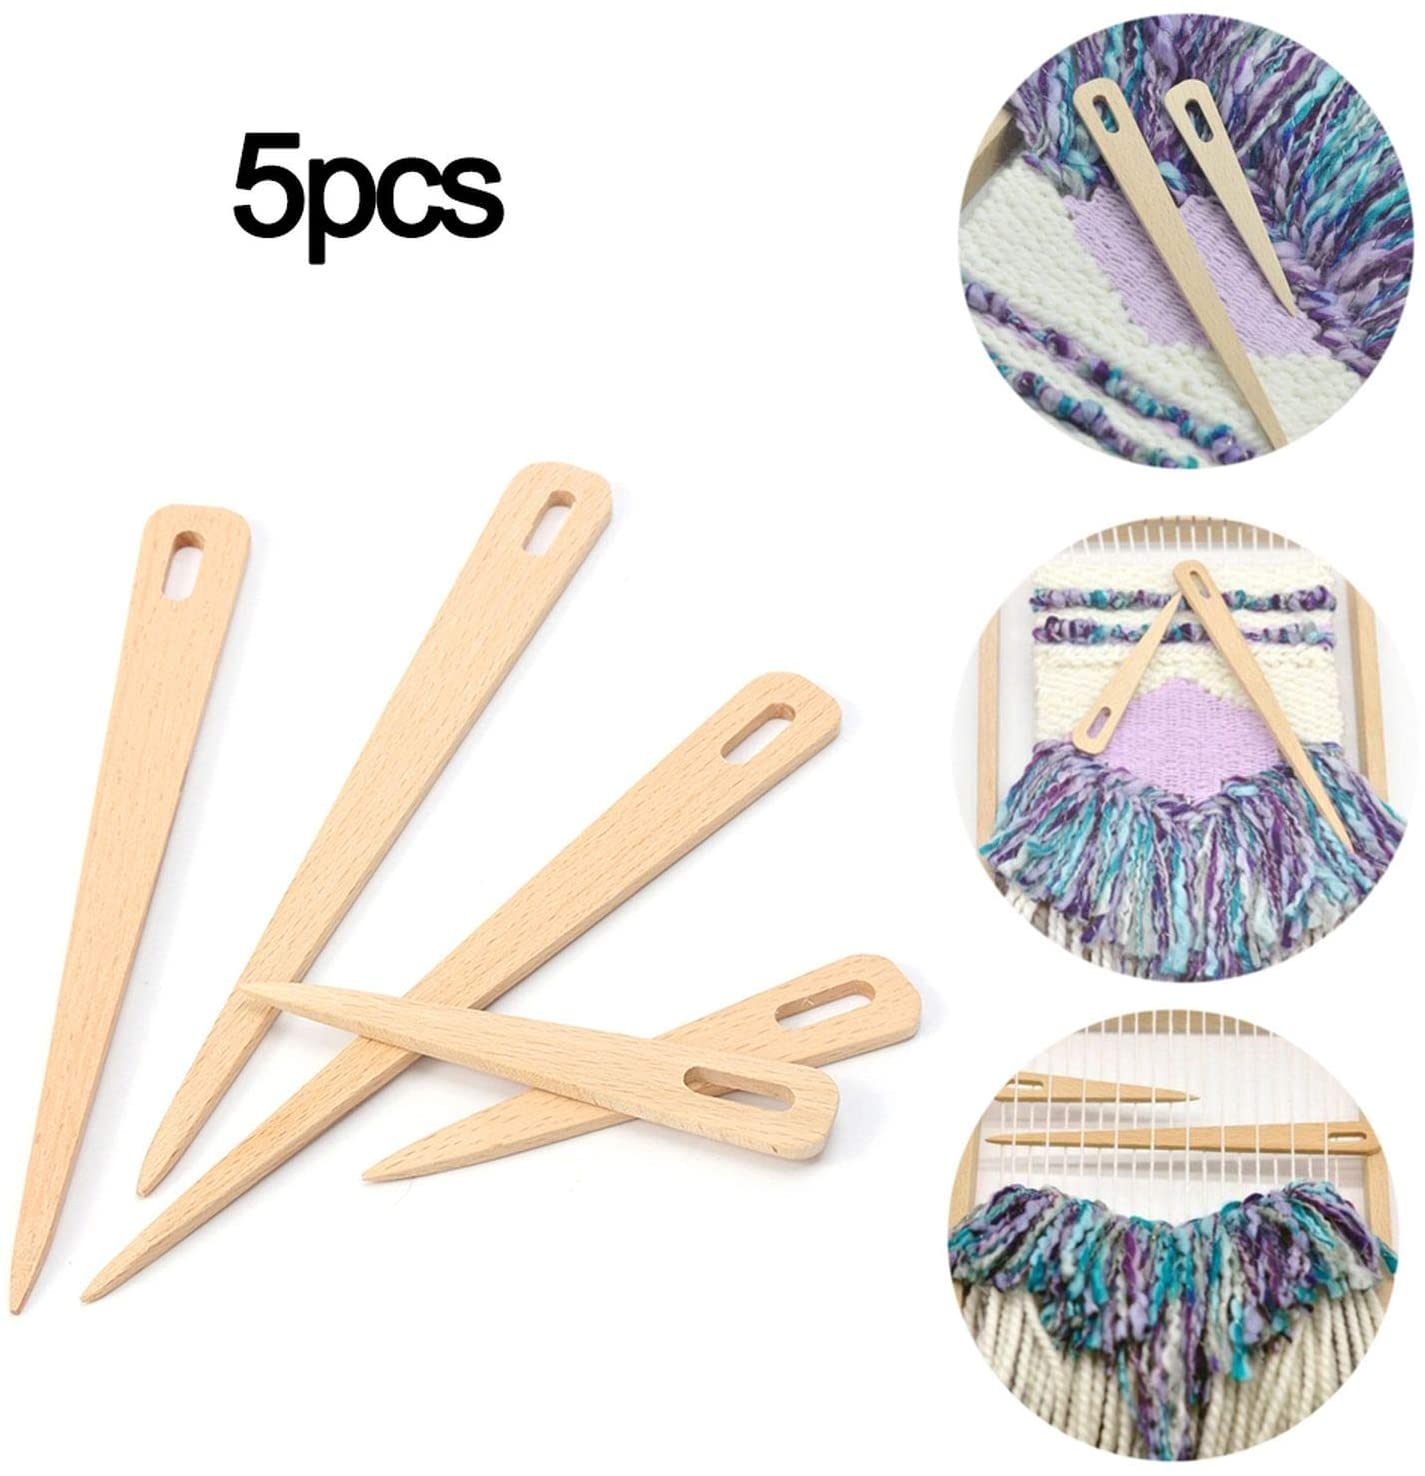 5 Pcs/Set Big Eye Yarn Knitting Needle Sewing Needles Wooden Tapestry Darning Knitting Needles Needlework DIY Crafts